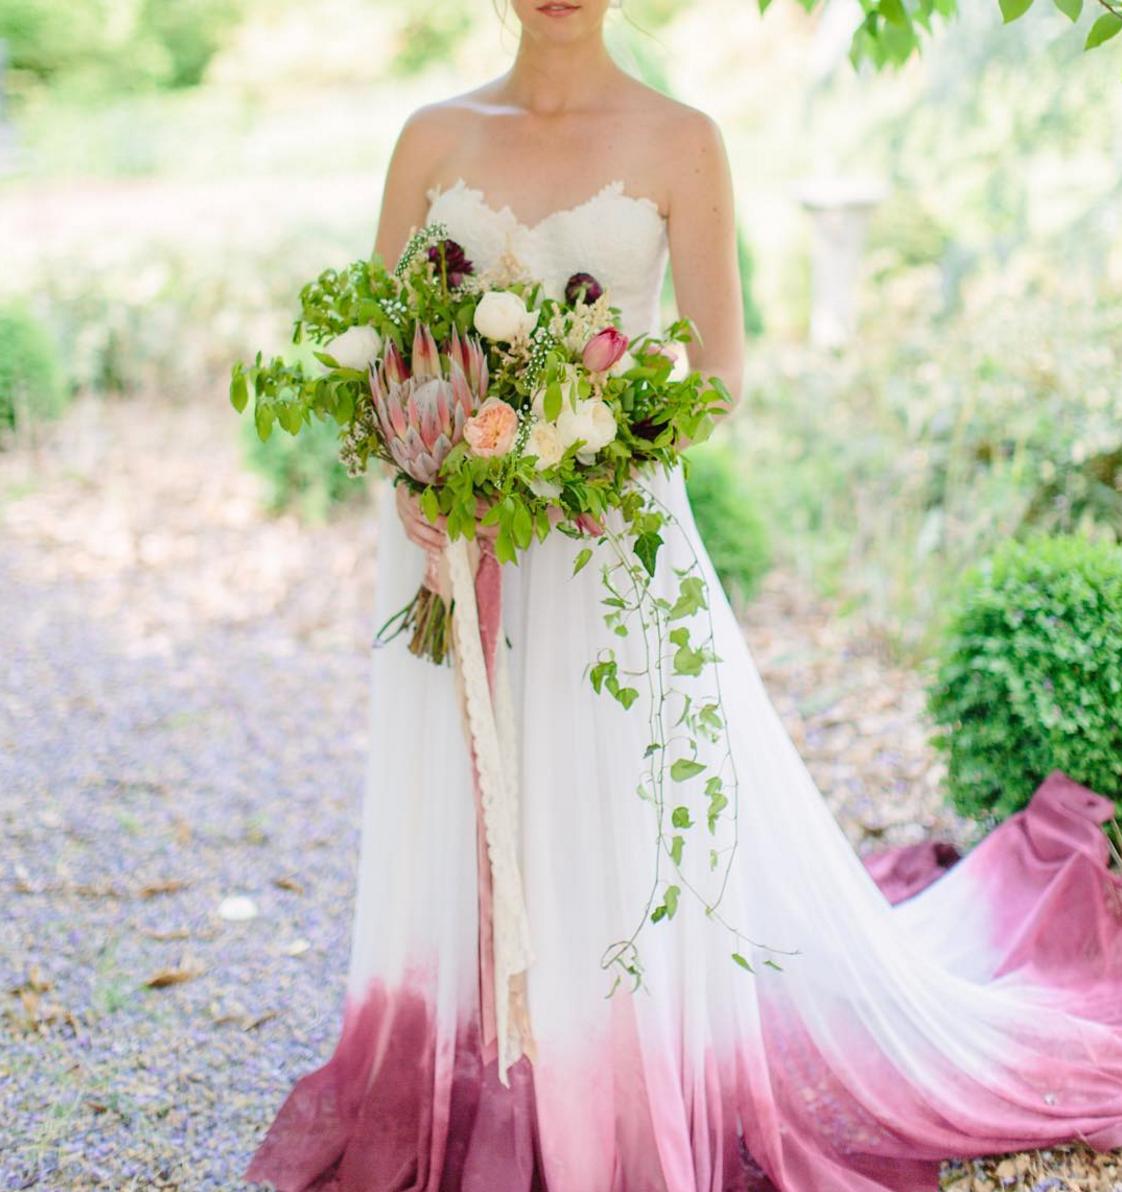 Wedding dress dip dyed in pink // Diy dye wedding gown trend ...